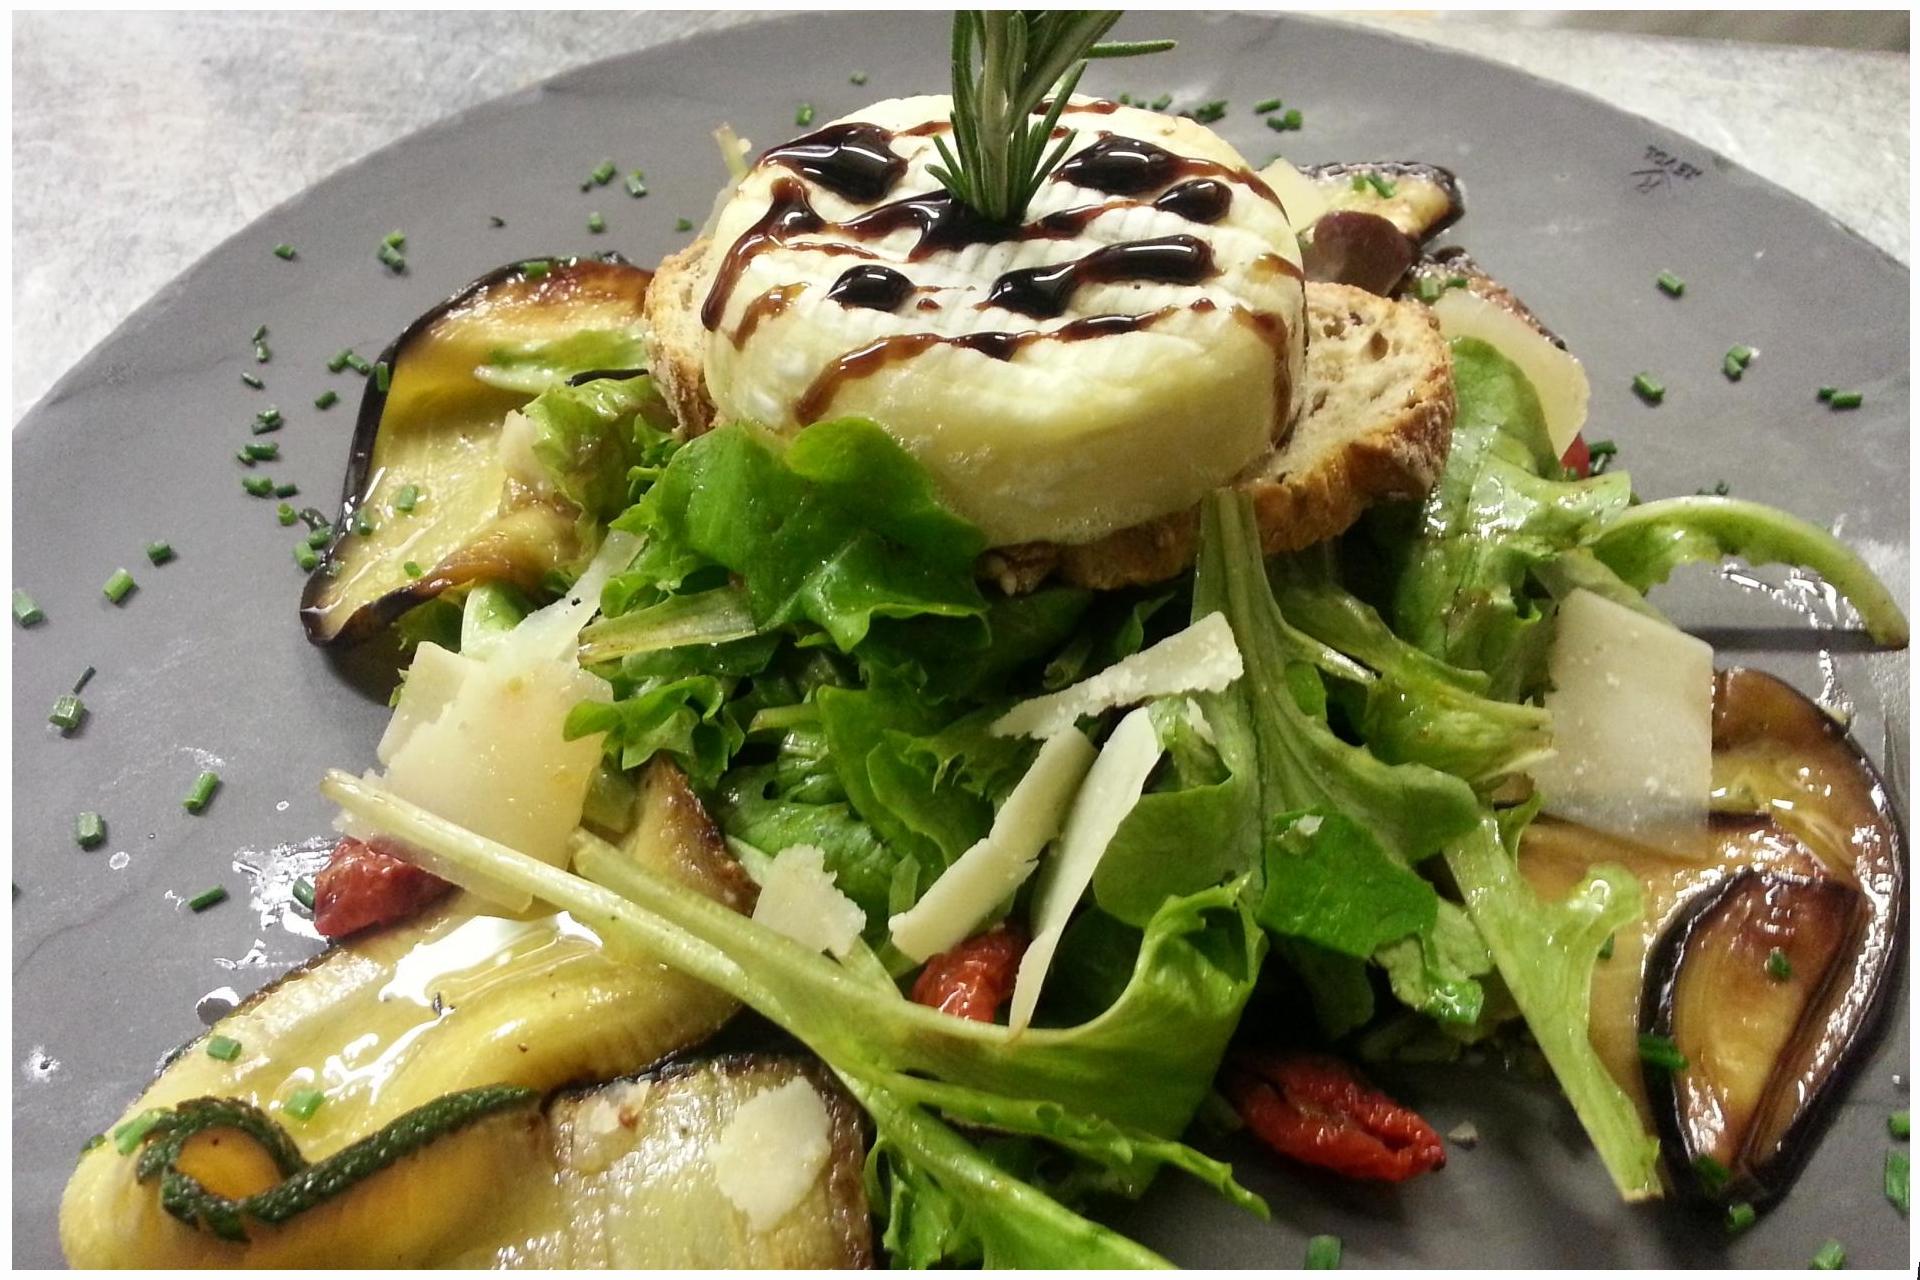 Bella storia restaurant italien cannes - Congeler des plats cuisines ...